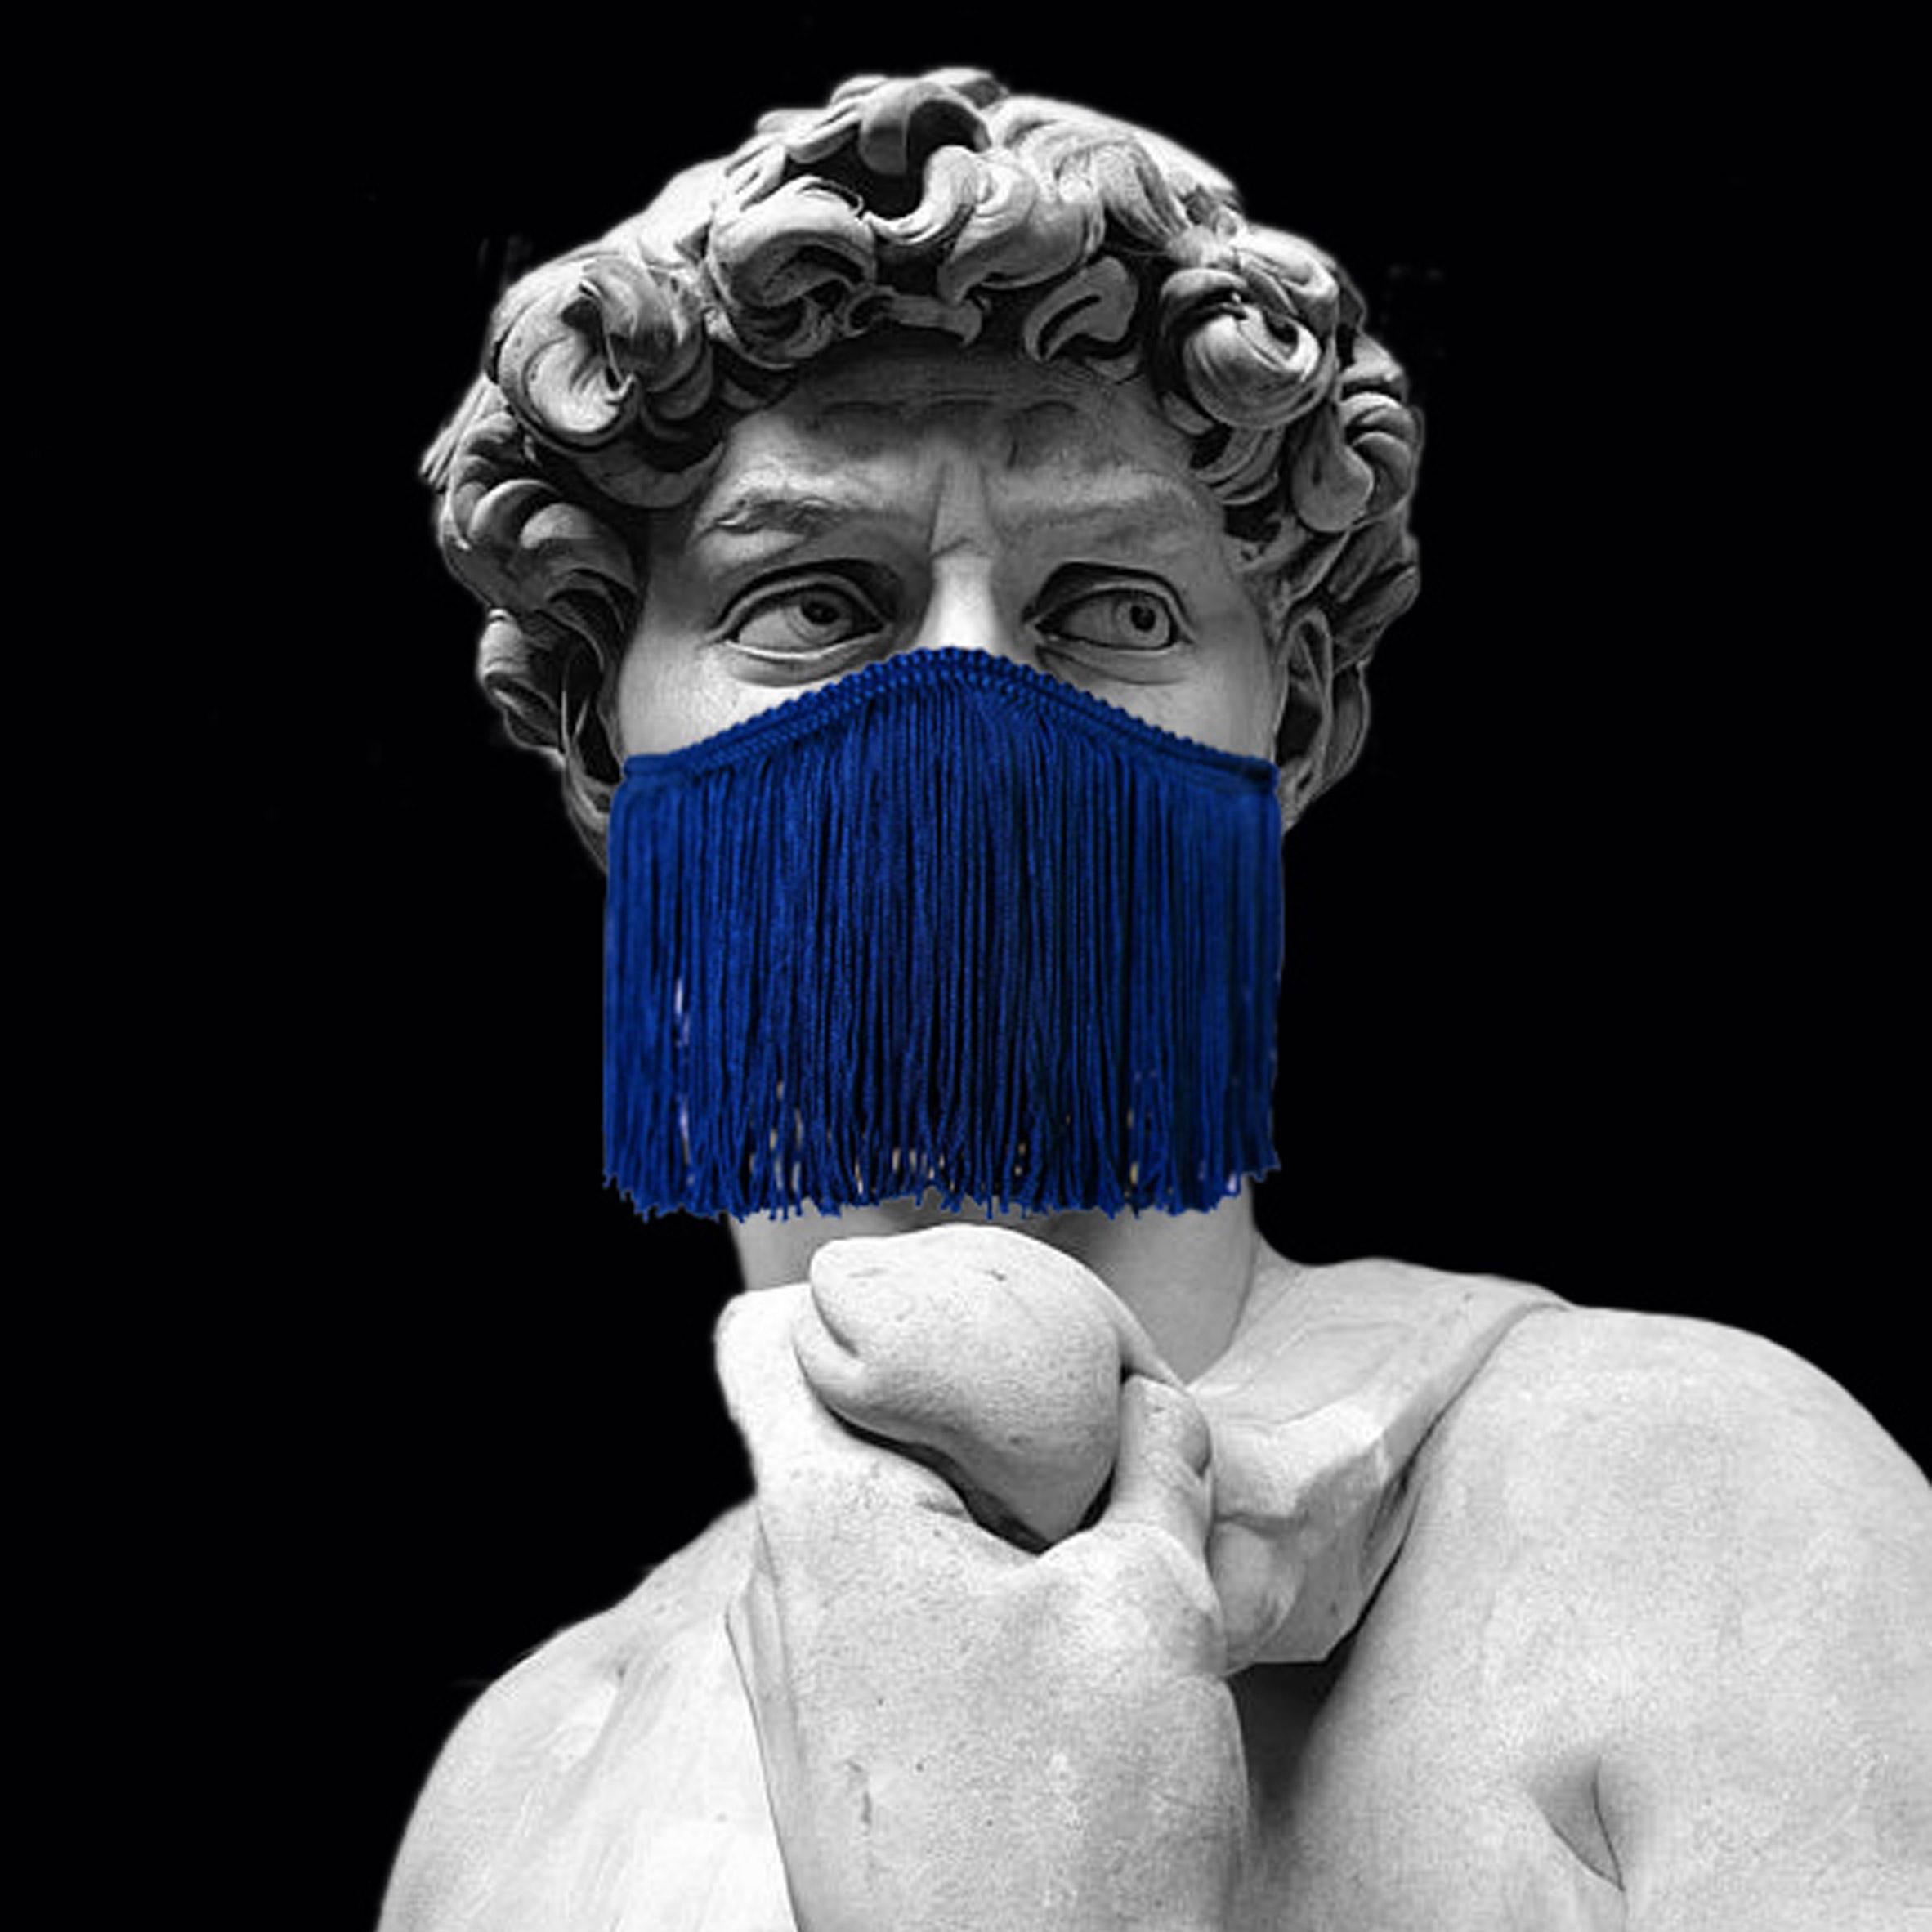 Michelangelo David wearing Le Freak face mask by Droog